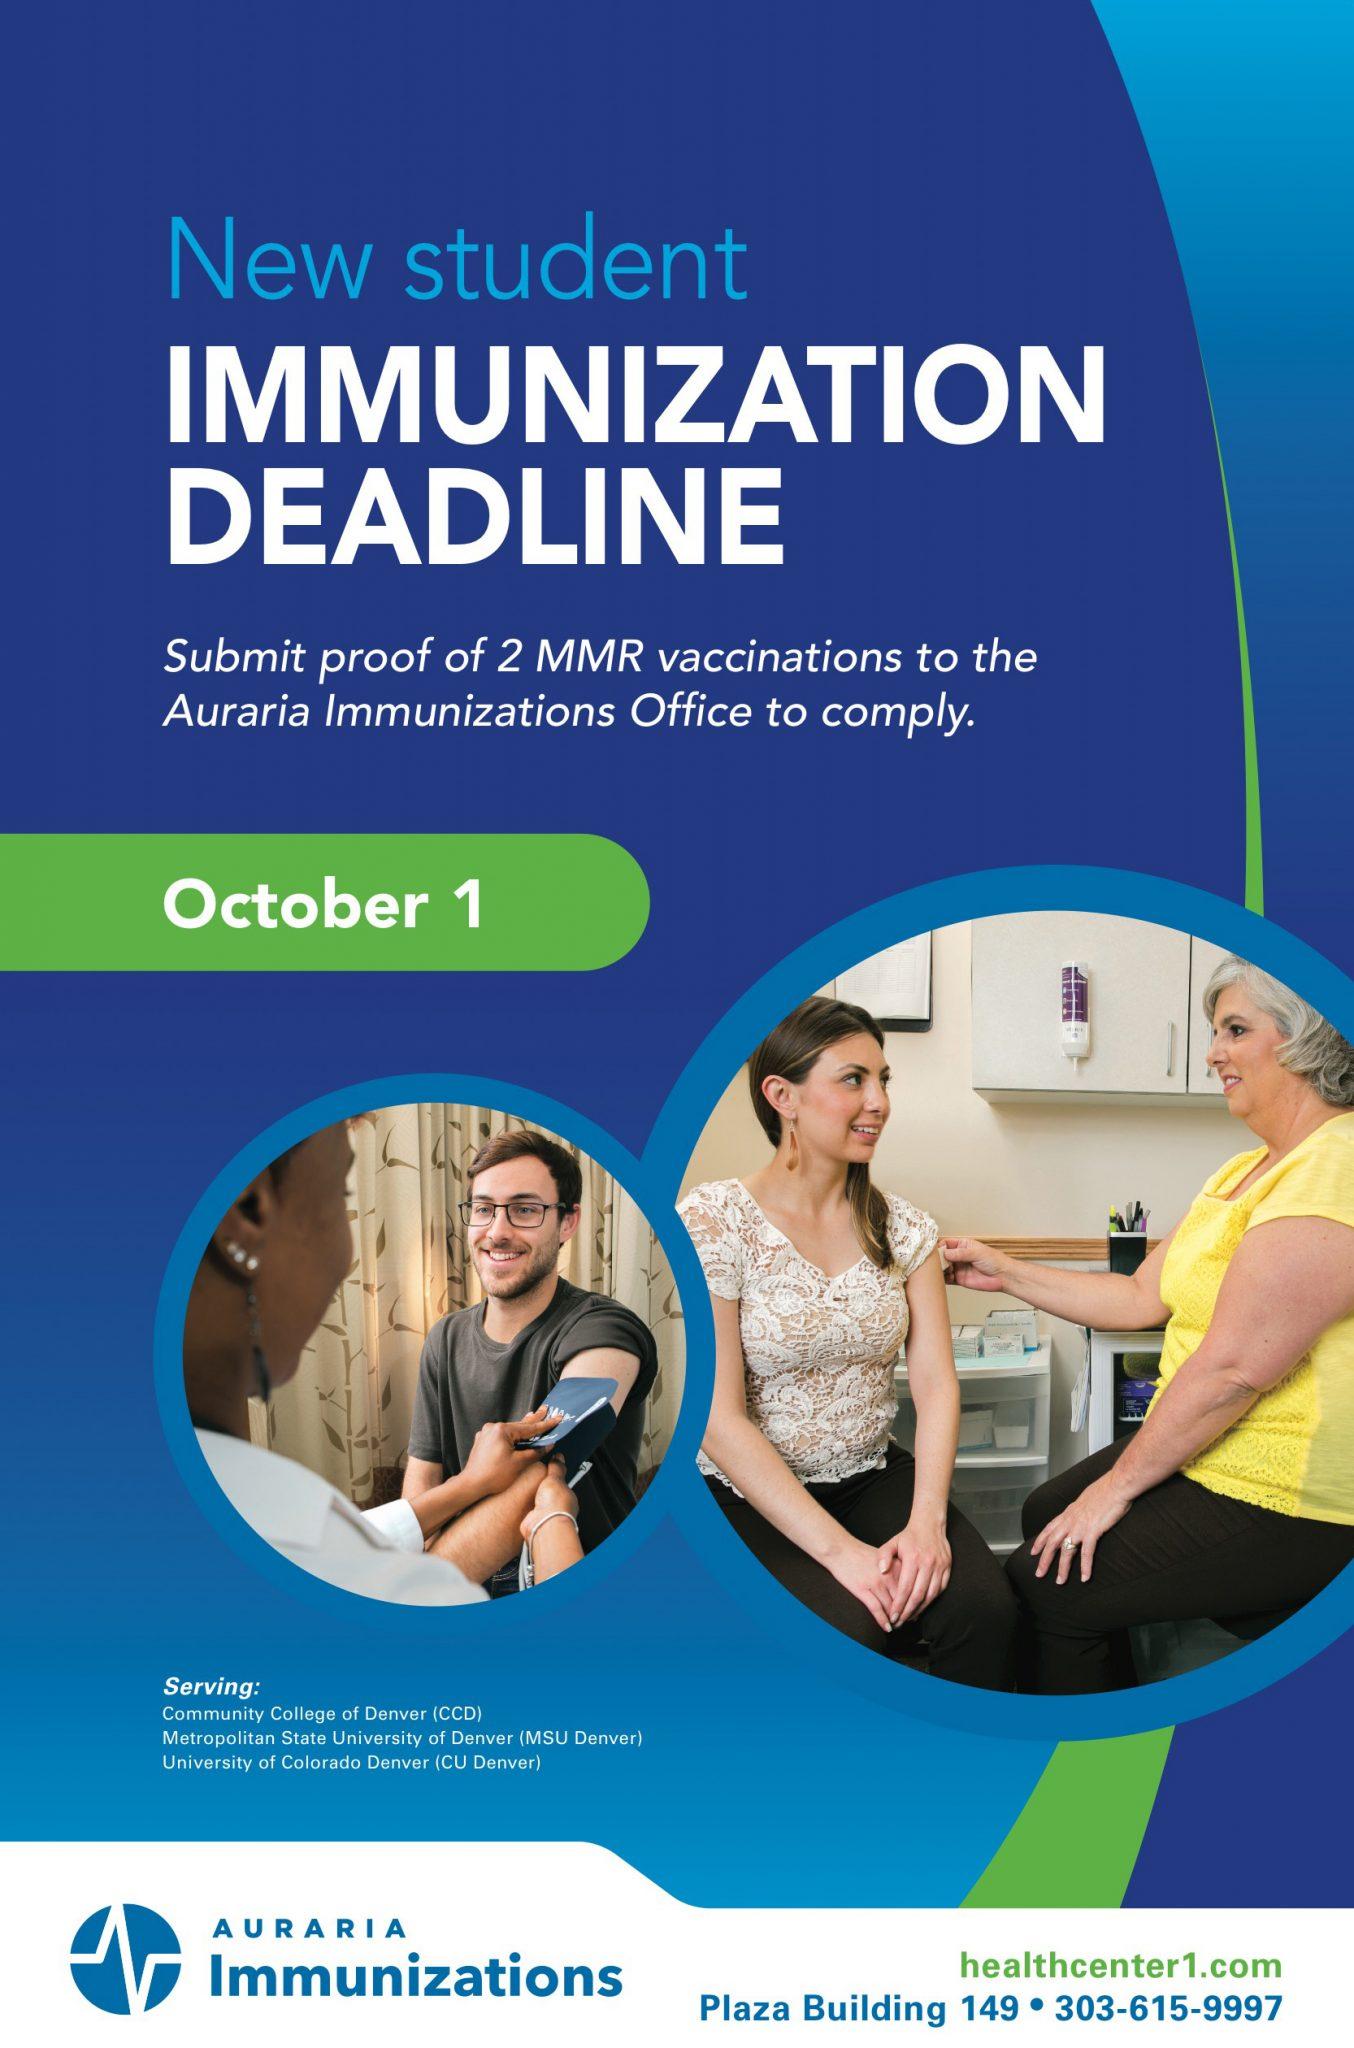 New Student Immunization Deadline